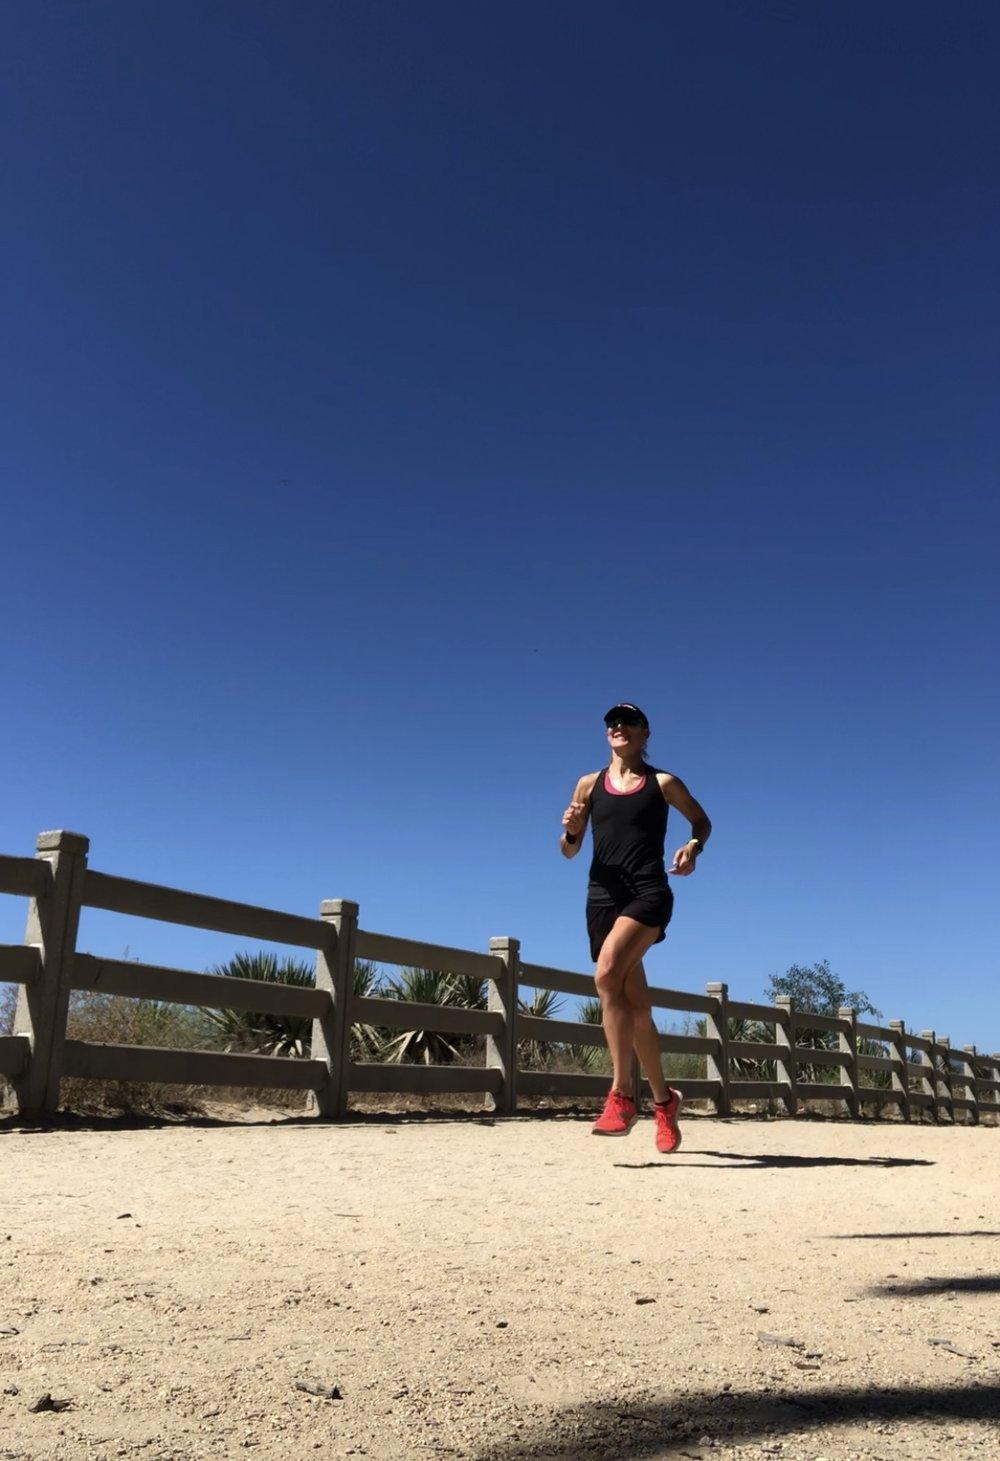 Post Sunday long run jaunt in Santa Monica.